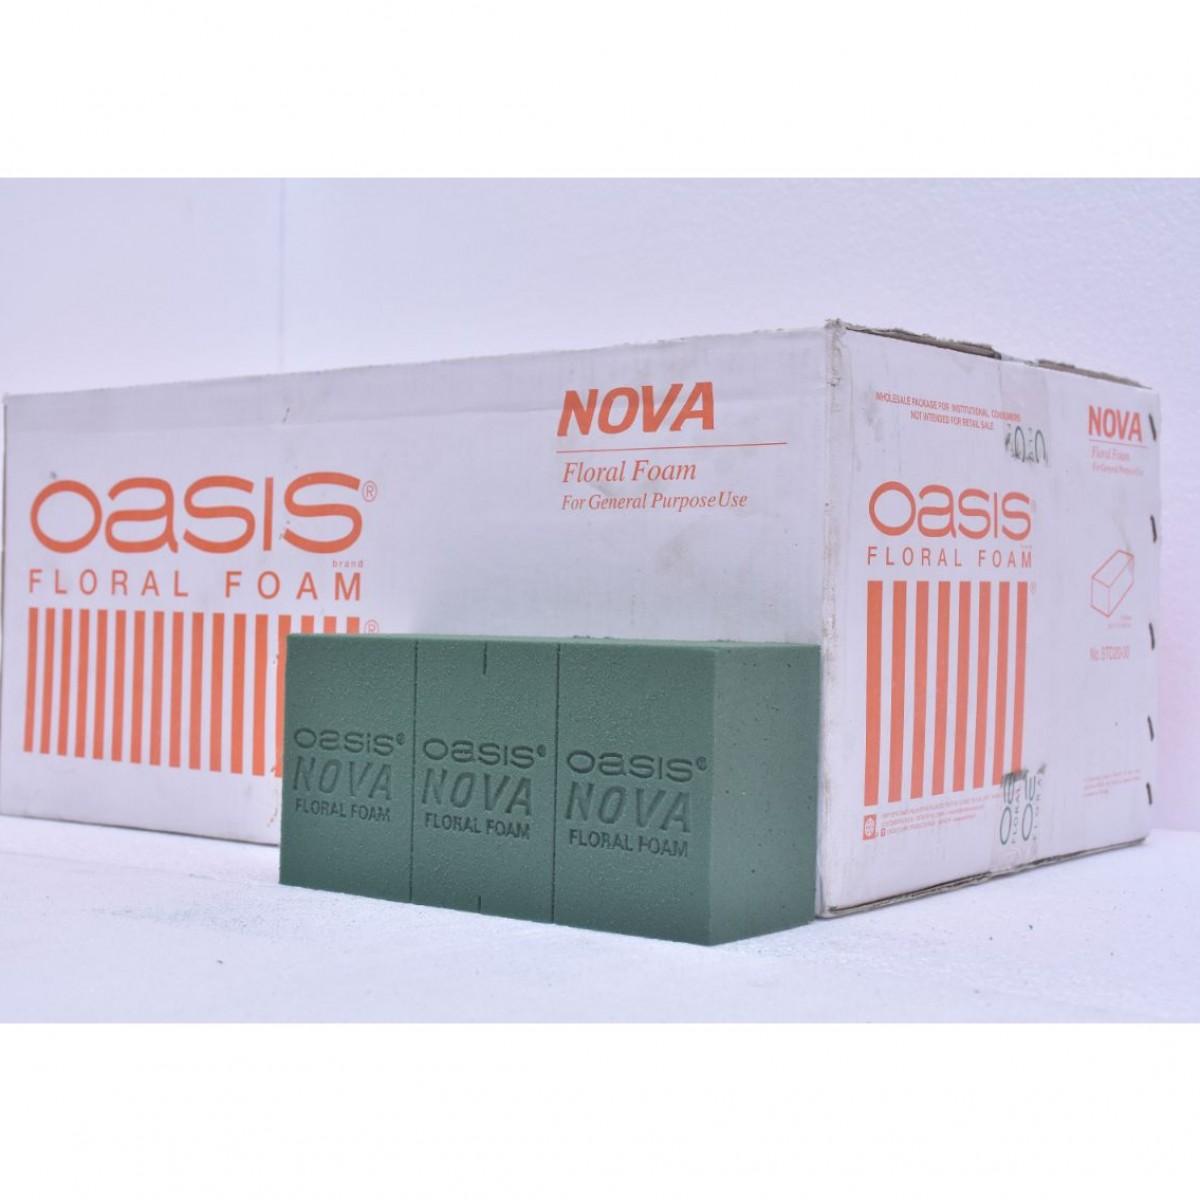 Nova Bricks (20 No) - Oasis Floral Foam Bricks